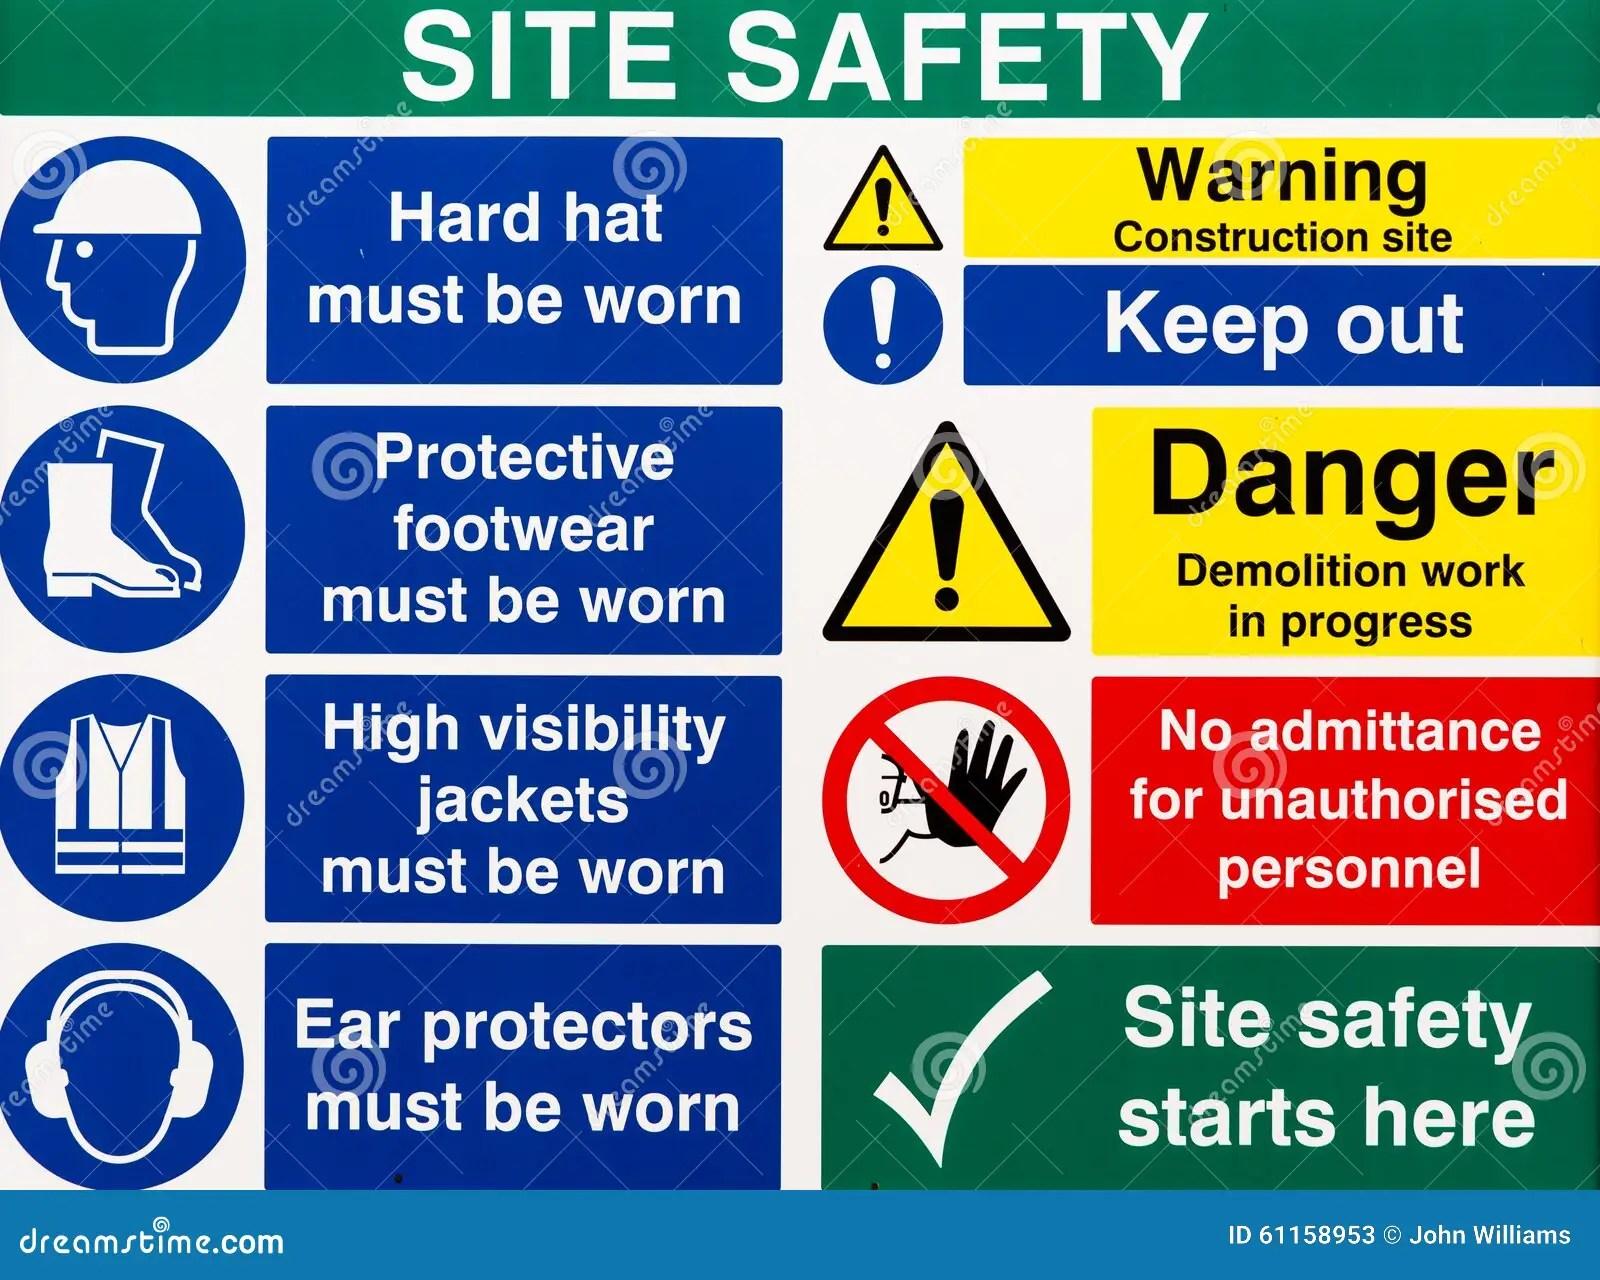 Site Saftey Warning Signs Stock Image Image Of Hazard